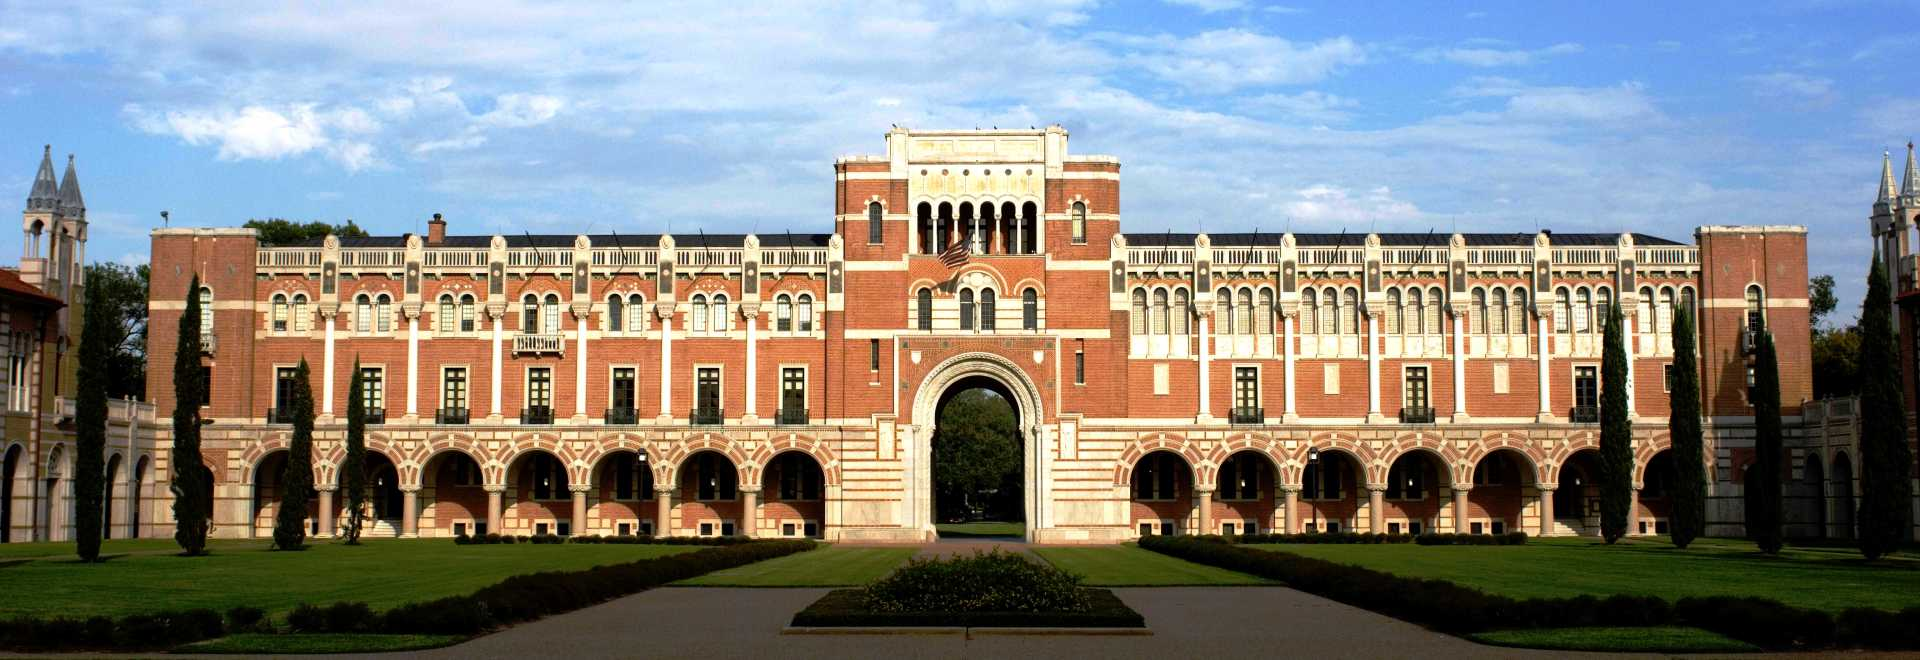 Houston Colleges Universities 14 Major Institutions